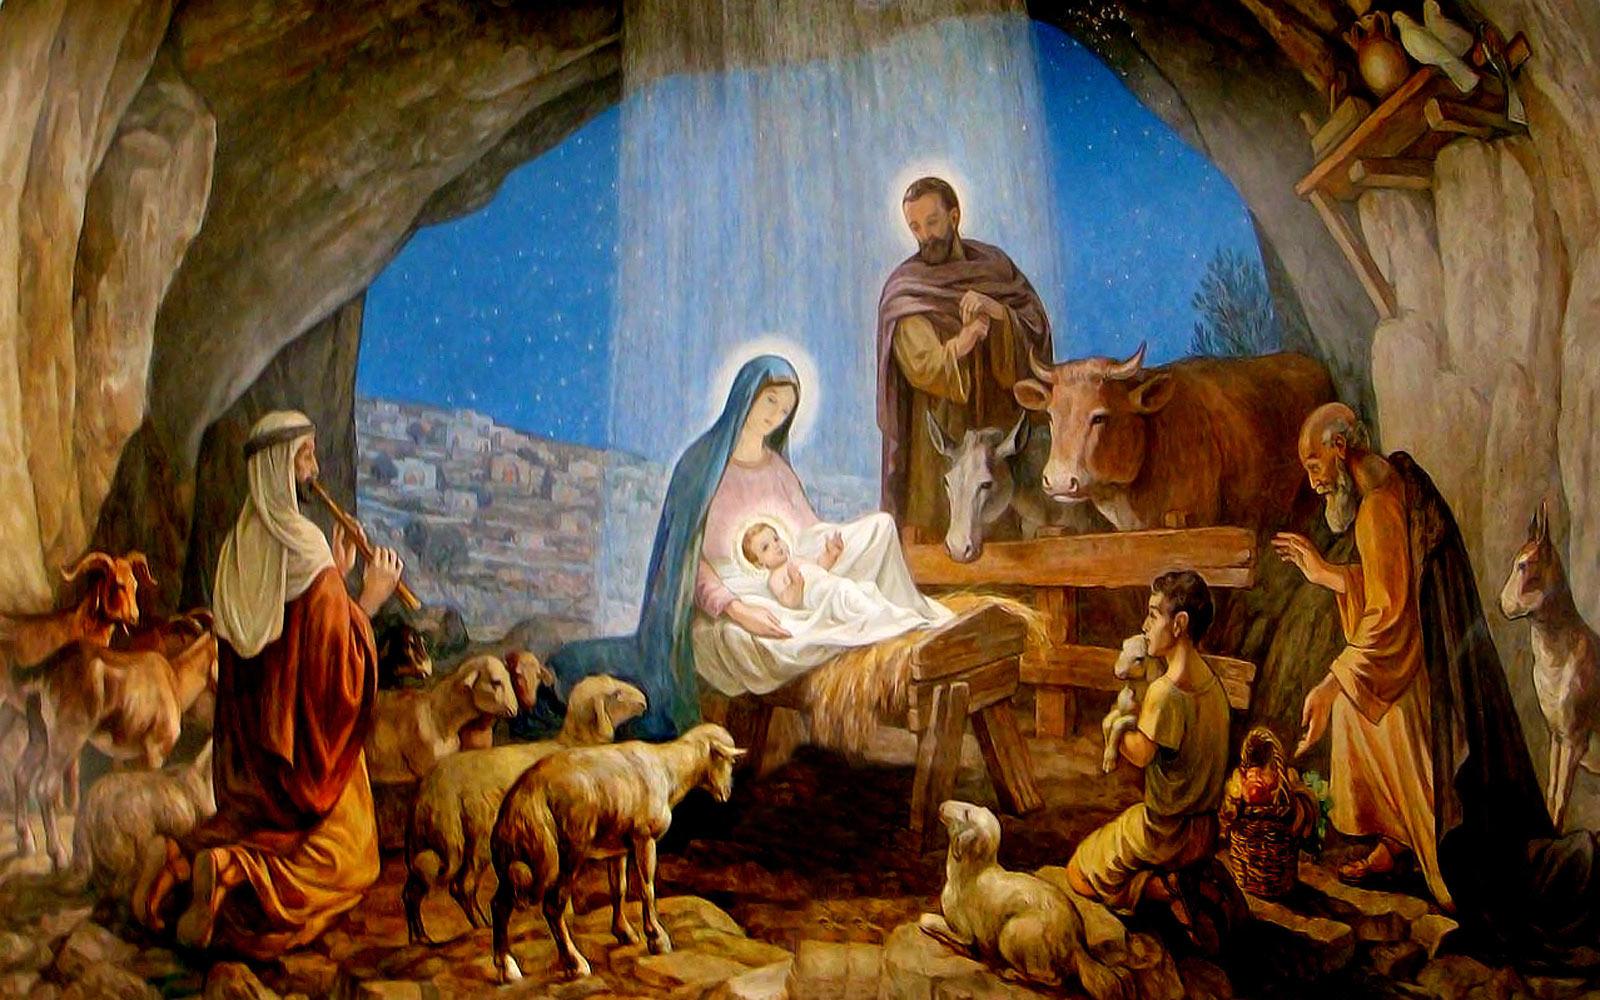 Sveta nazaretska Obitelj